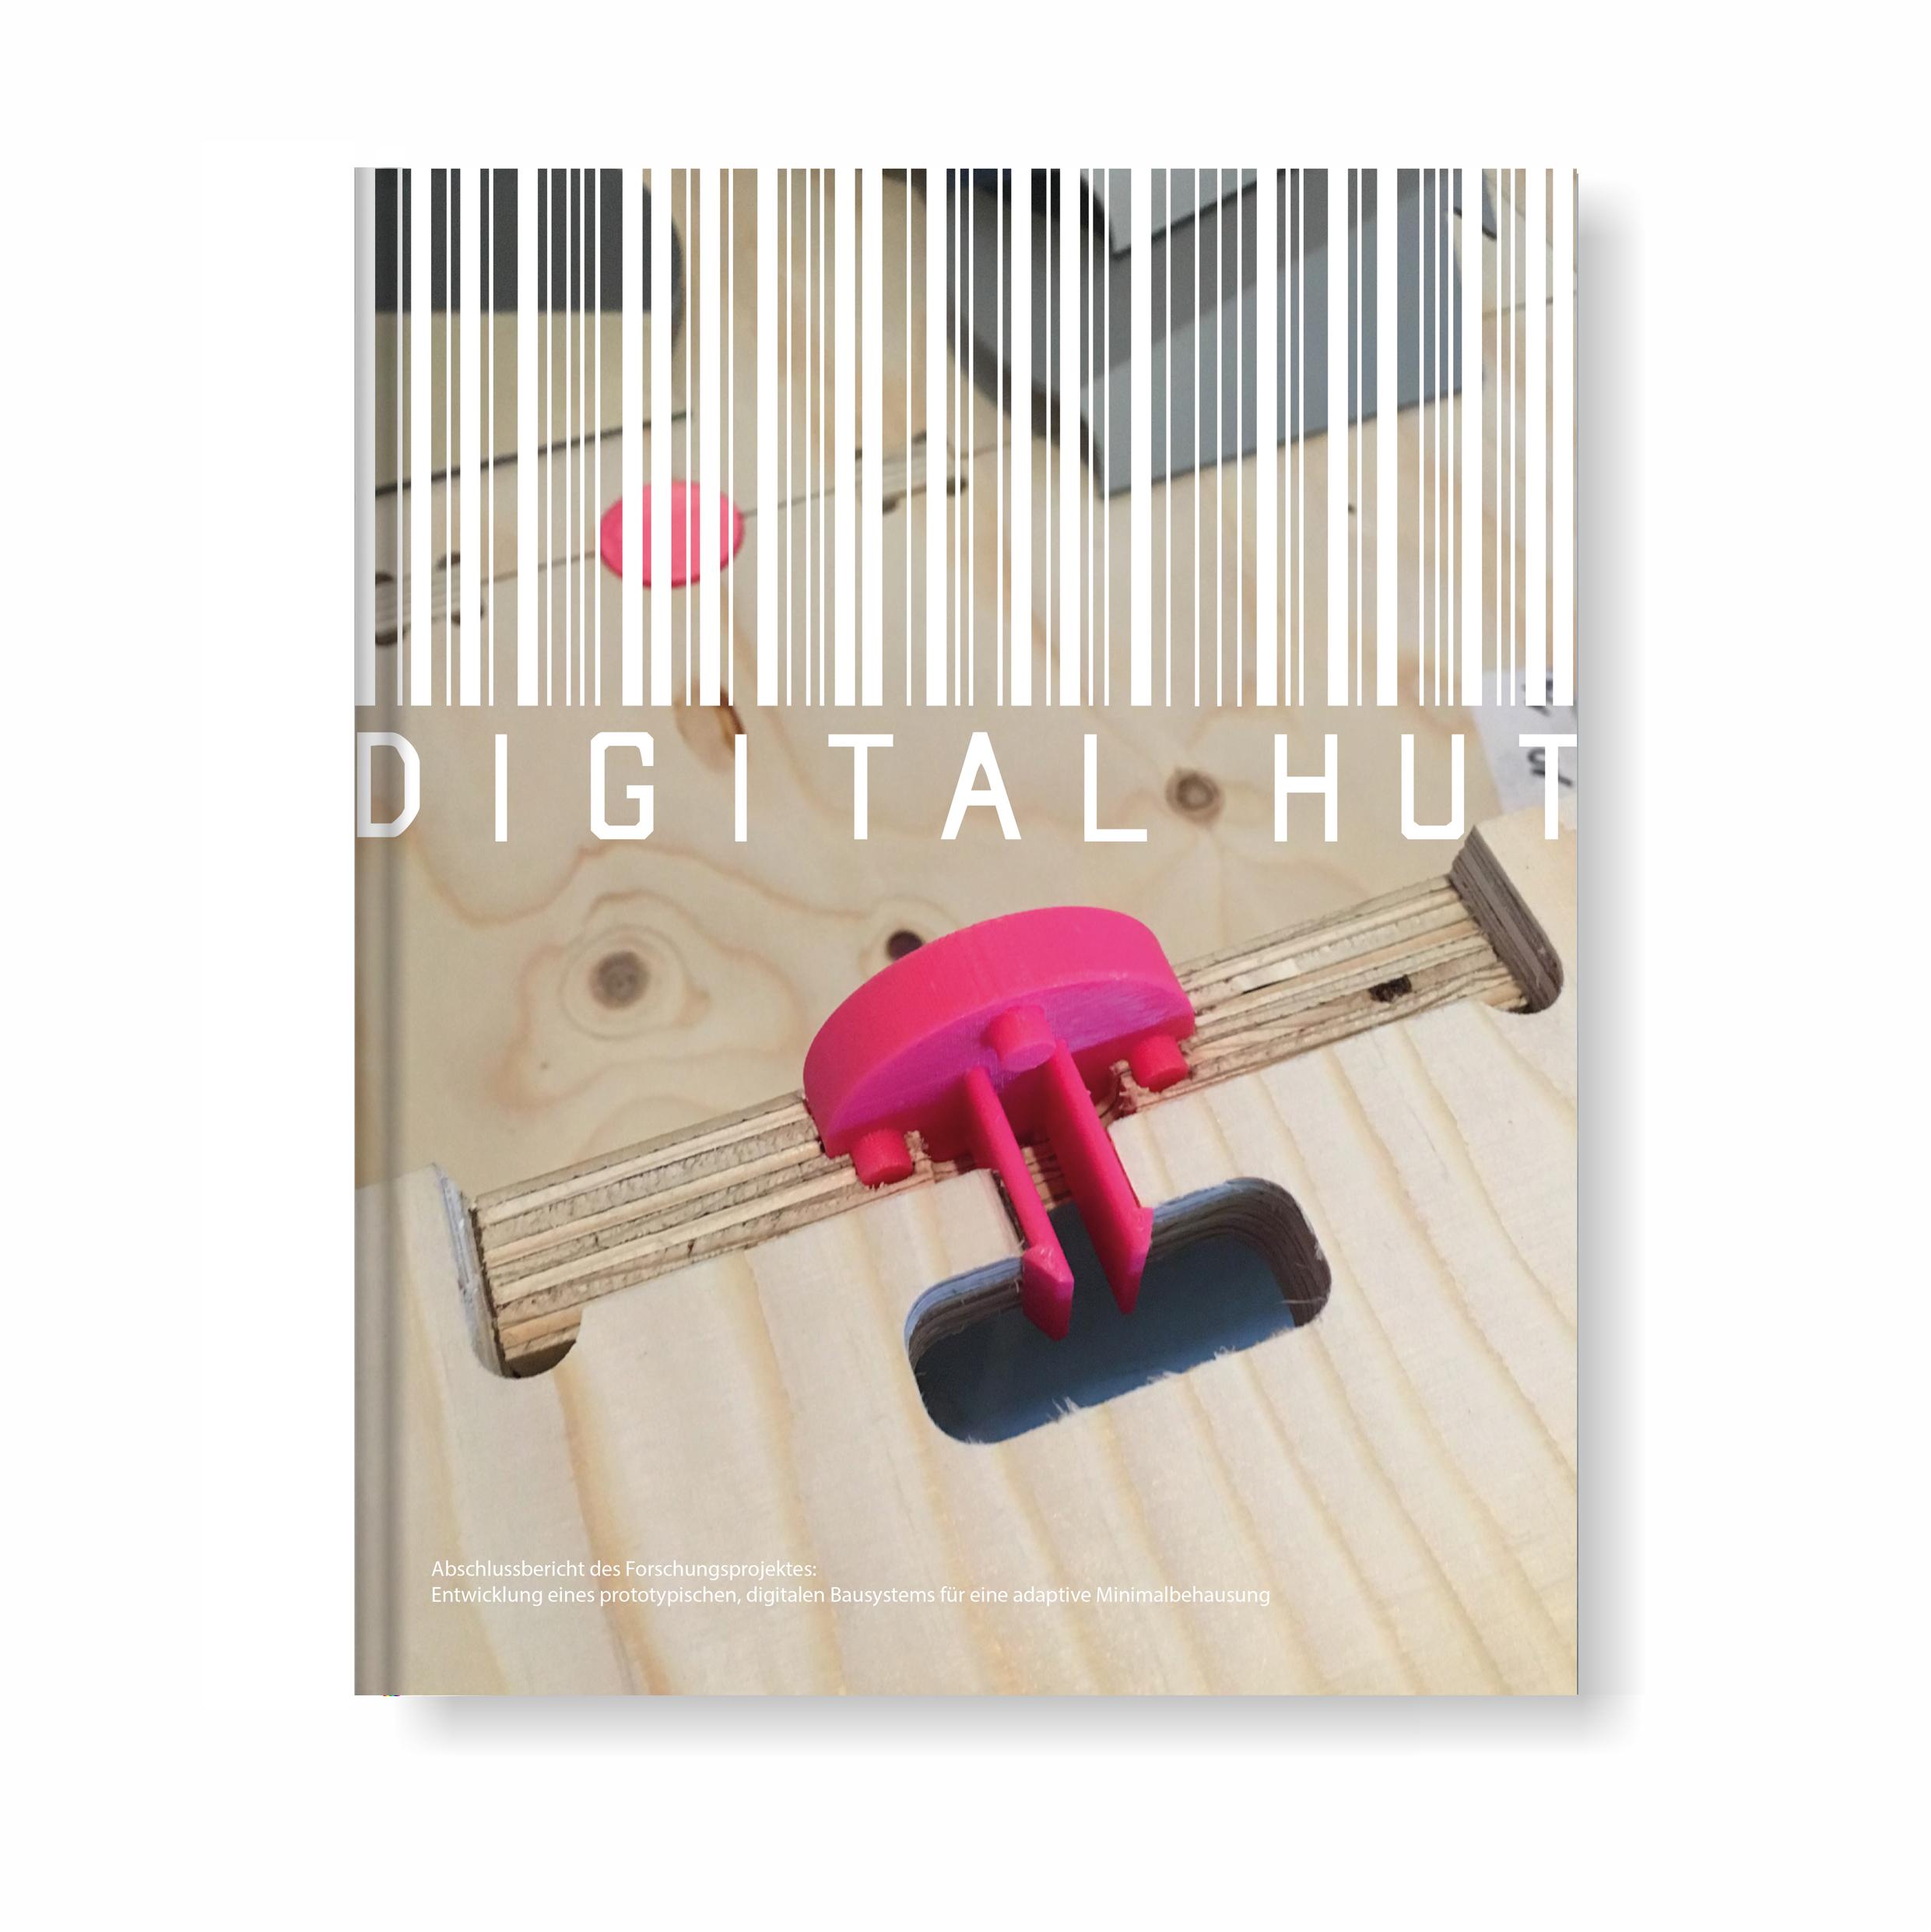 CAAD // Digital Hut